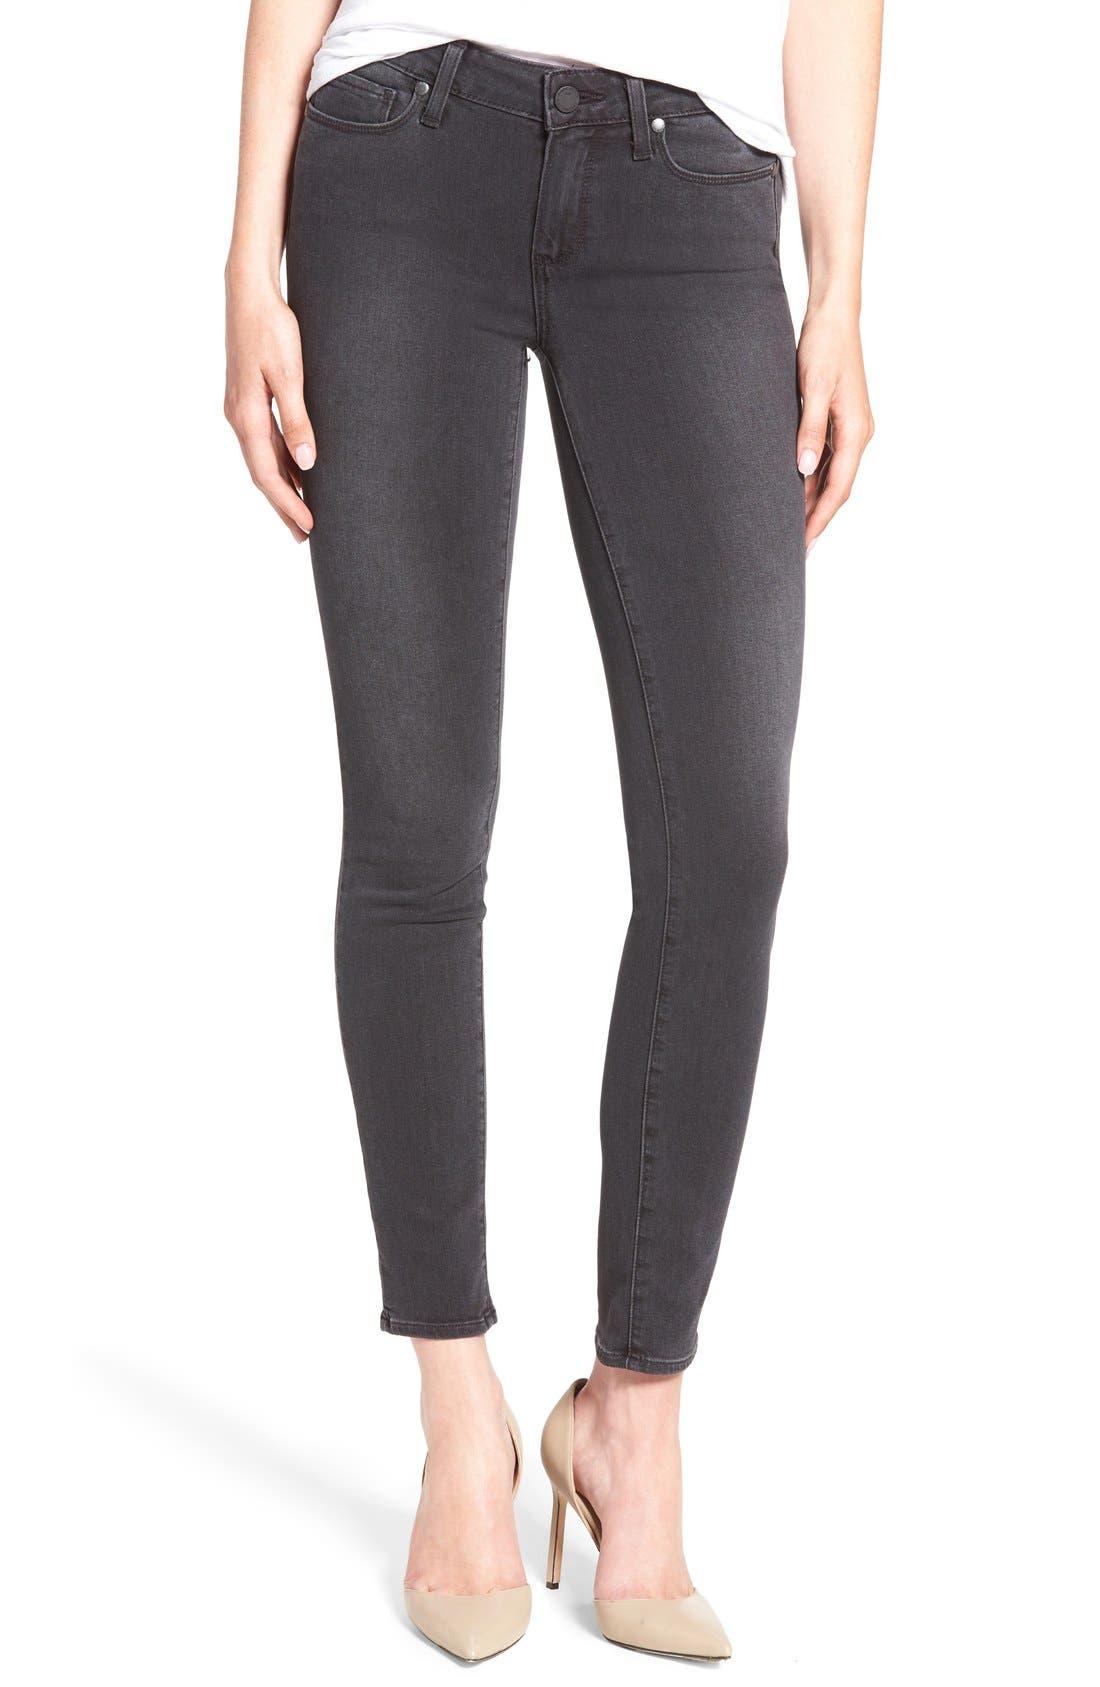 'Transcend - Verdugo' Ankle Skinny Jeans,                             Main thumbnail 1, color,                             020